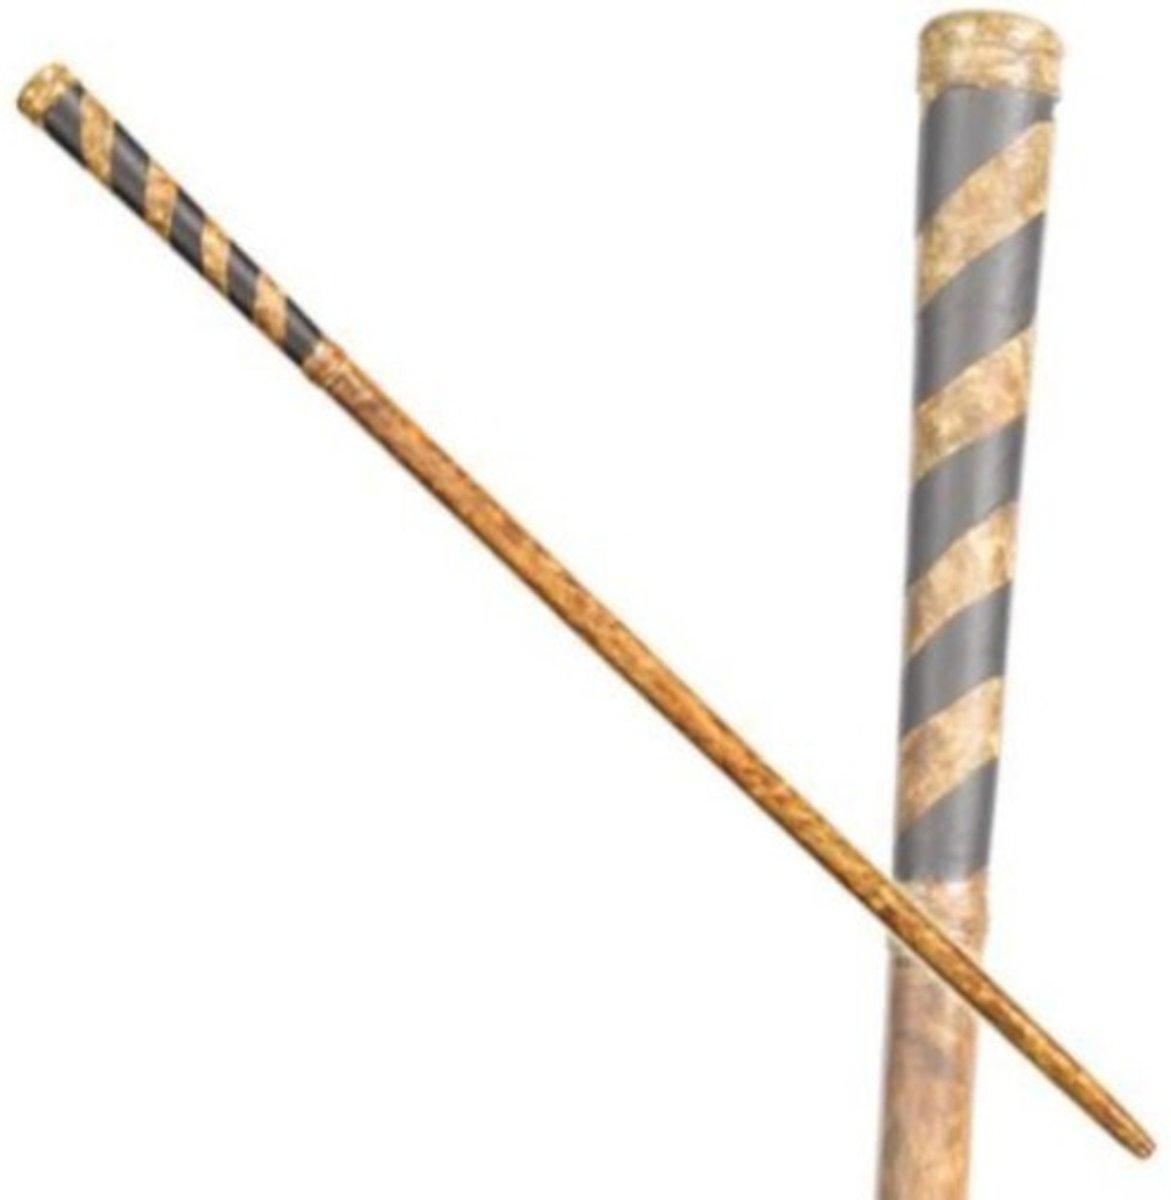 Harry Potter - Seamus Finnigan's Wand kopen